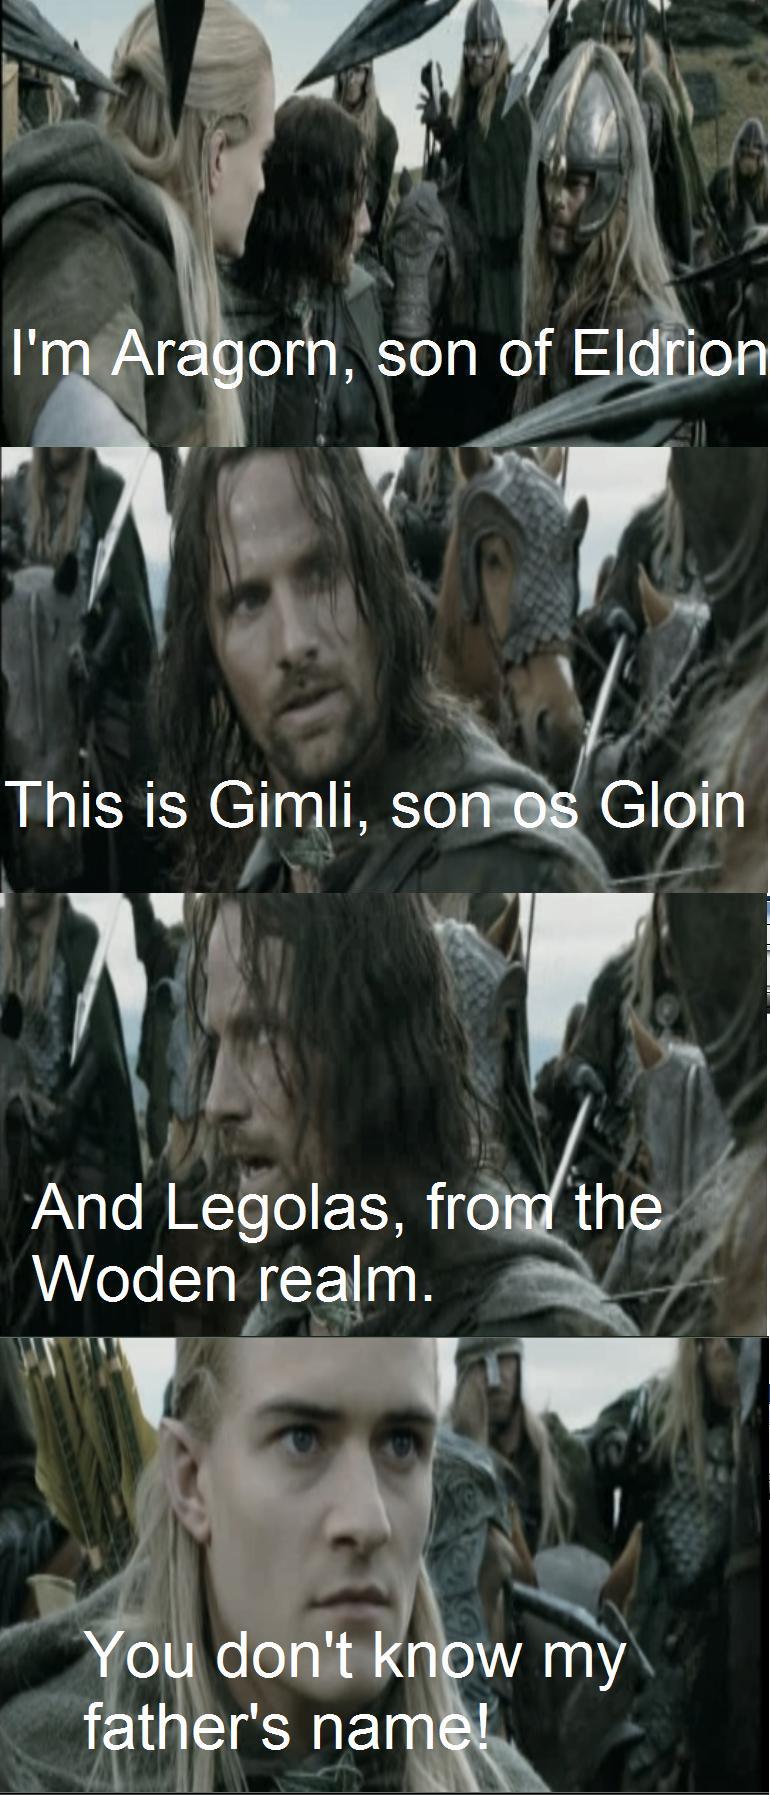 Poor Legolas